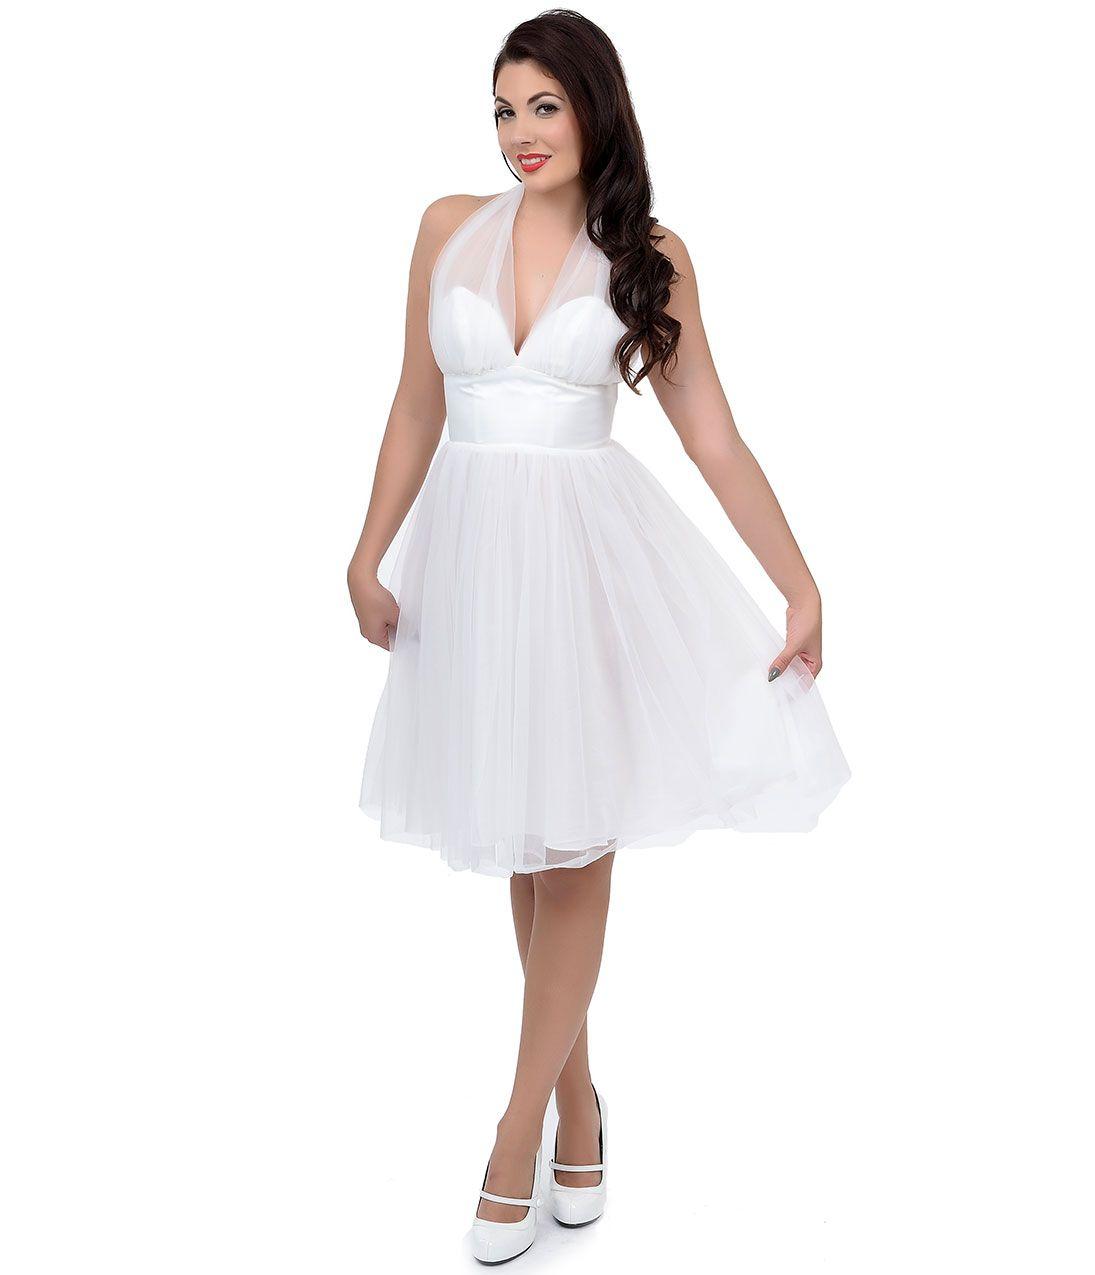 Plus size pin up style wedding dress  s Wedding Dress s Style Wedding Dresses Rockabilly Weddings